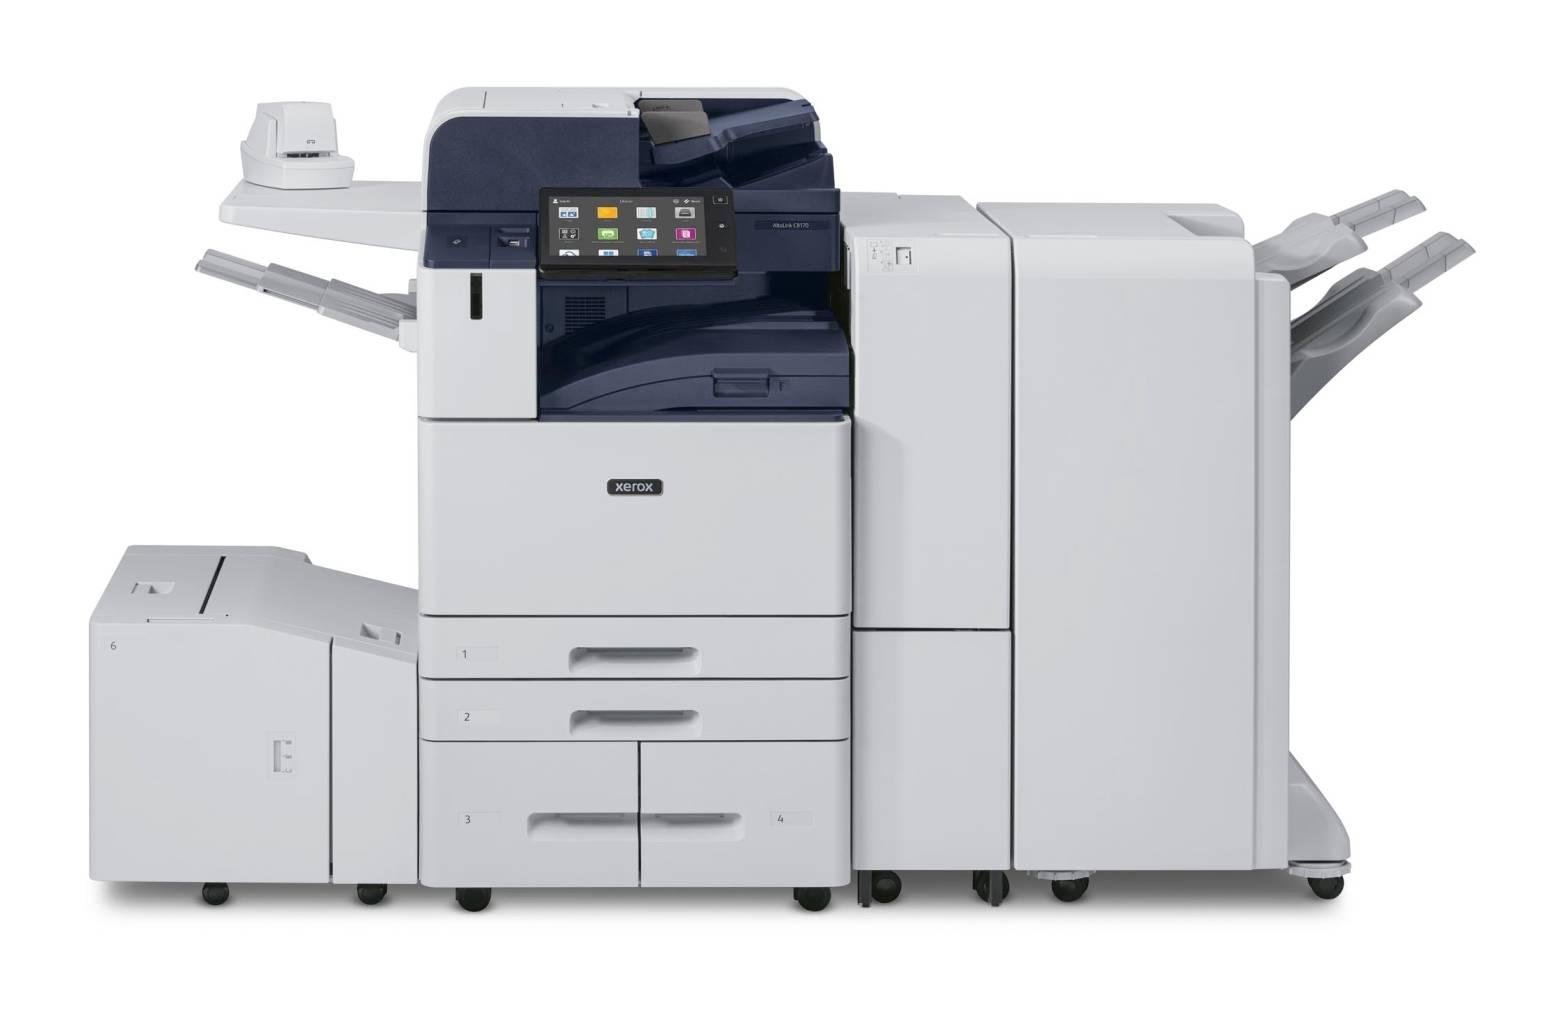 Impresora multifunción Xerox AltaLink C8130